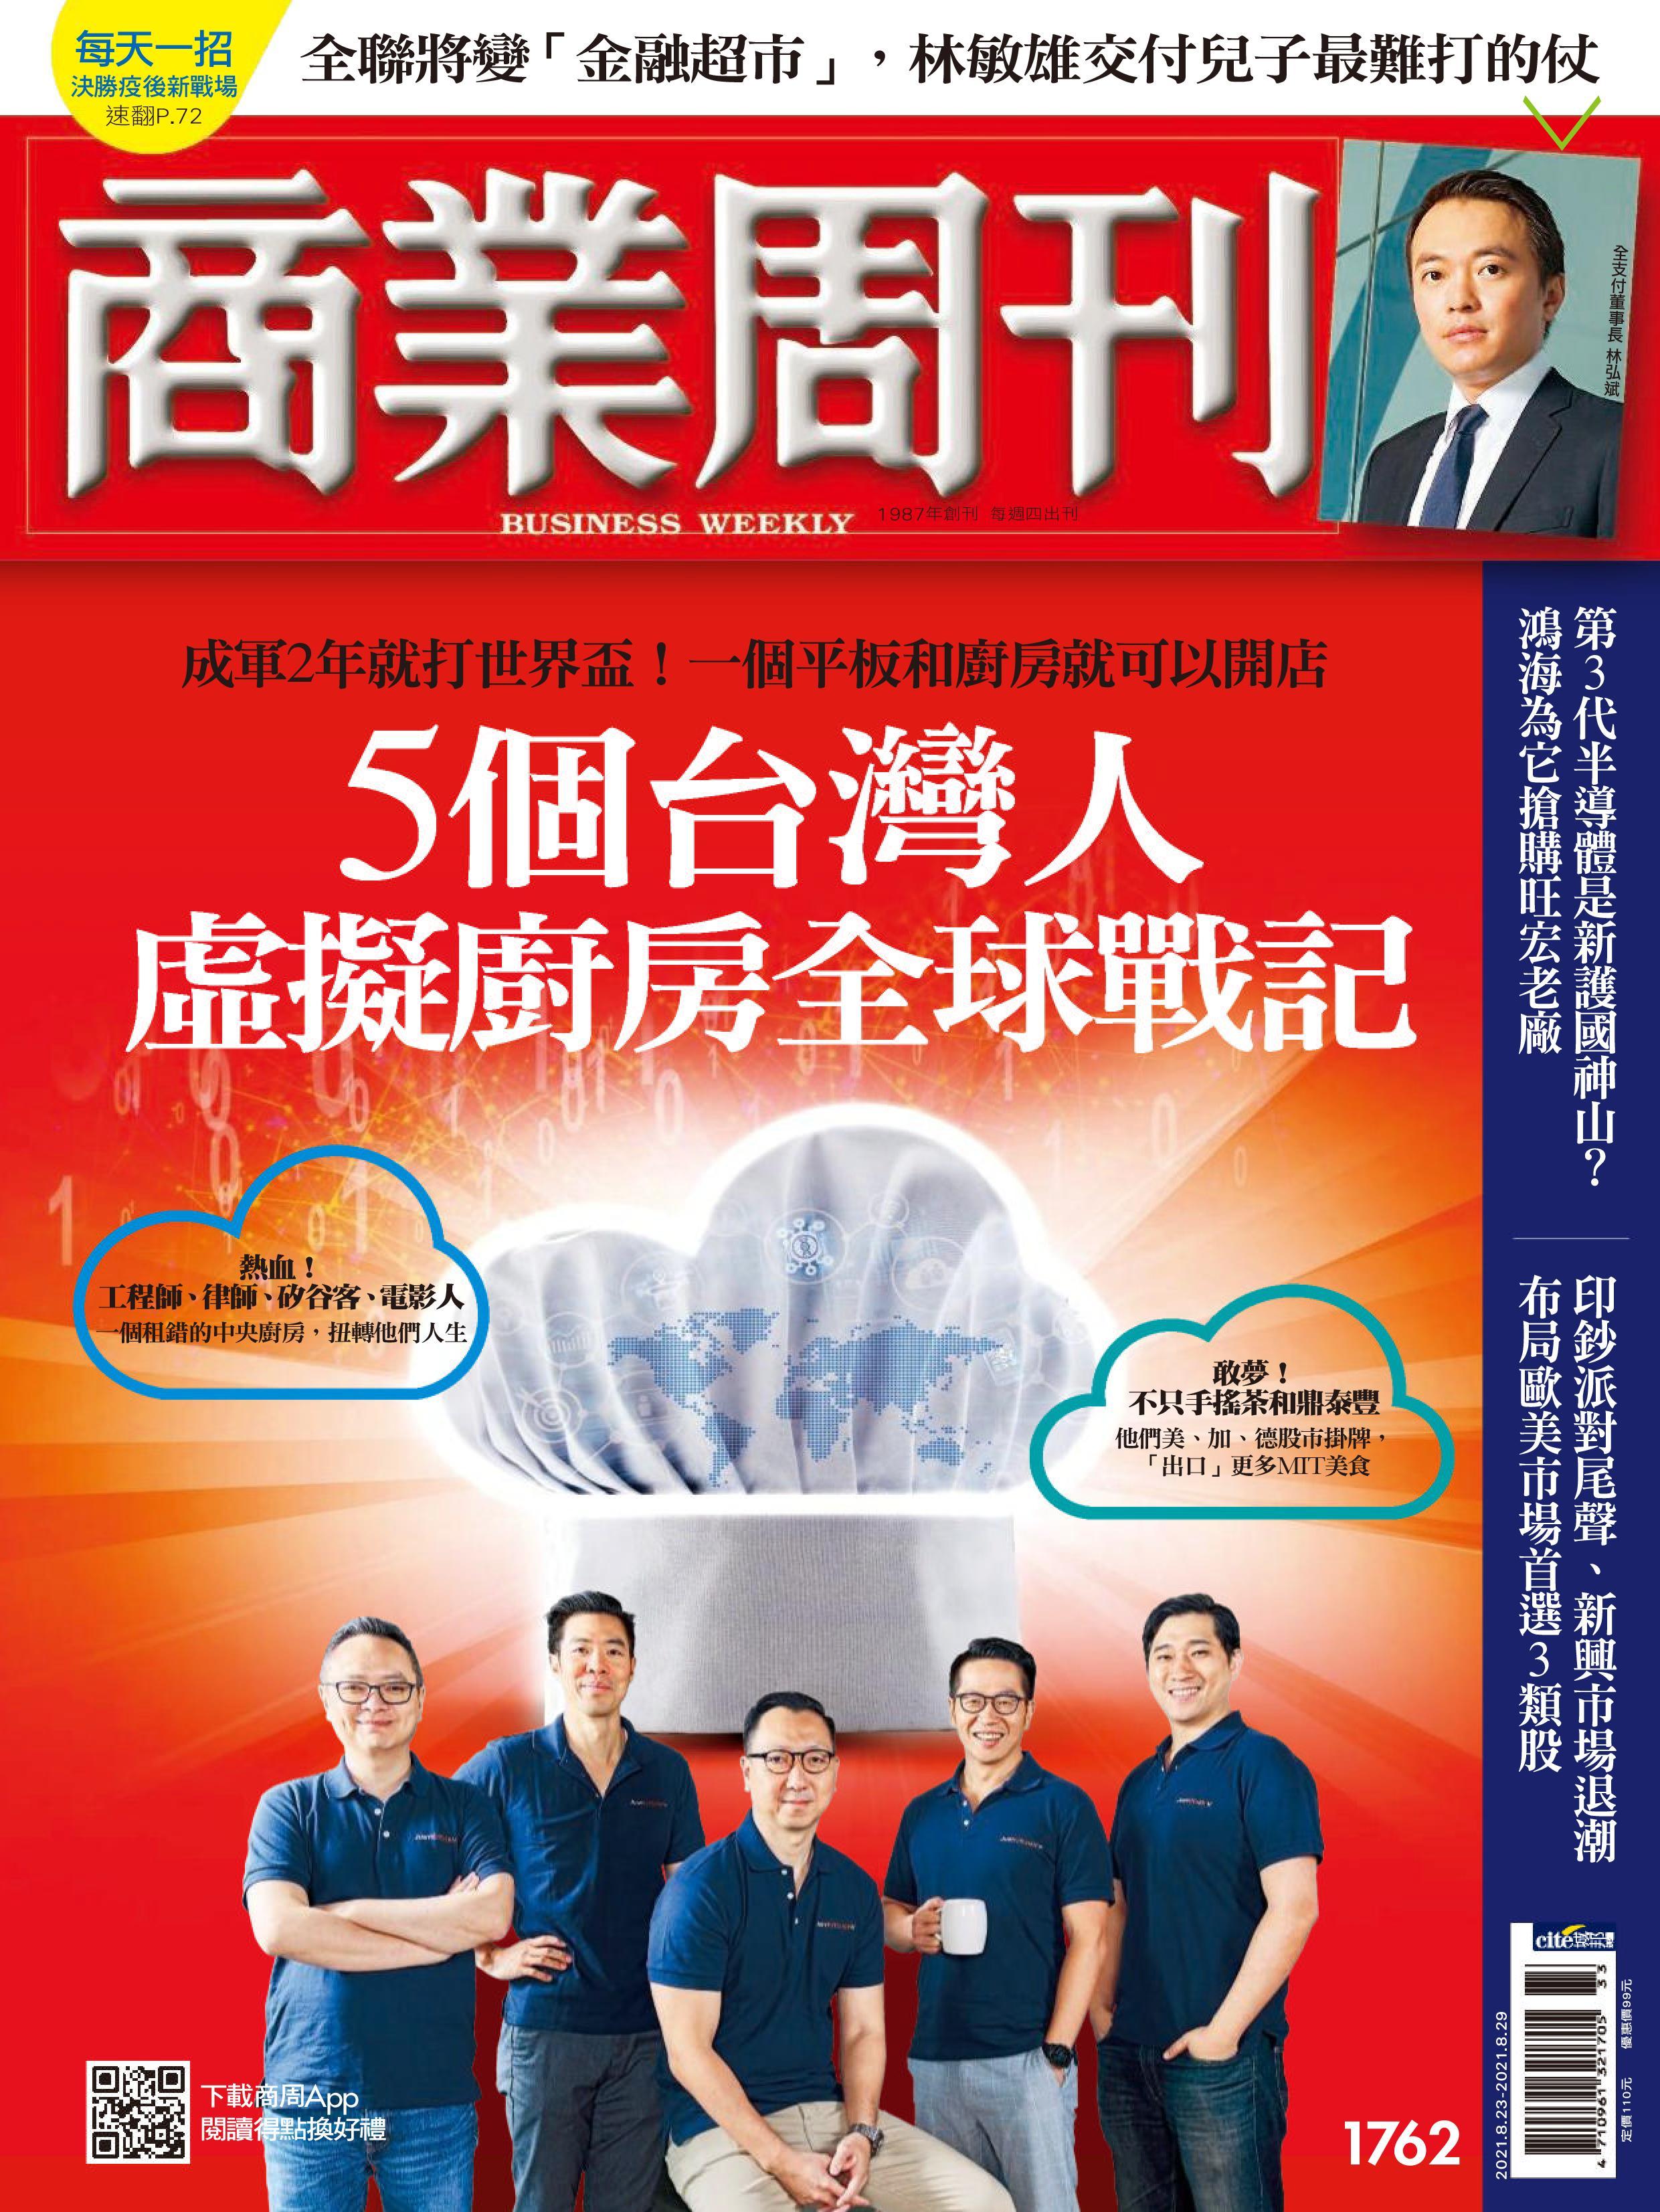 Business Weekly 商業周刊 - 23 八月 2021